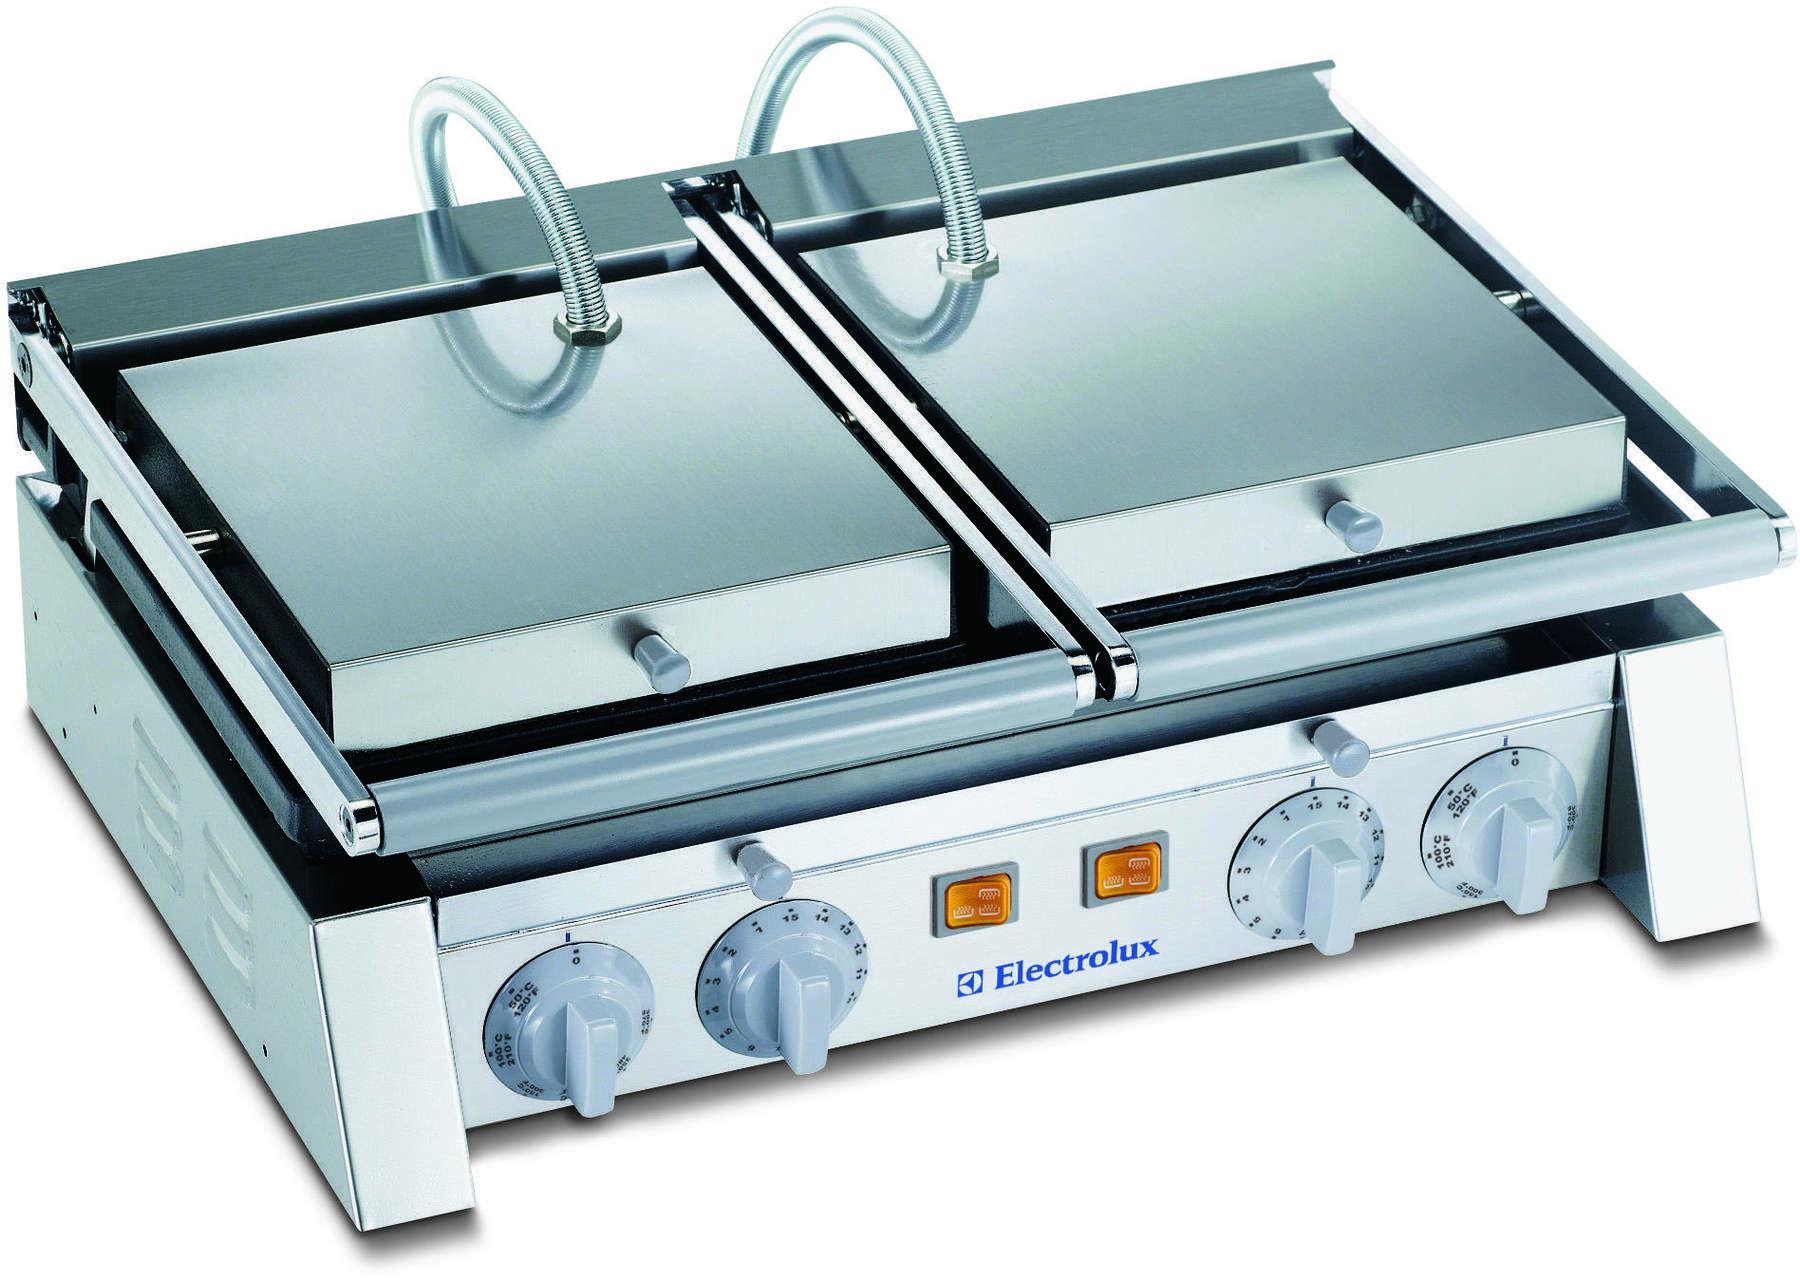 Electrolux Professional 602116 (DGSS20U | CKitchen.com